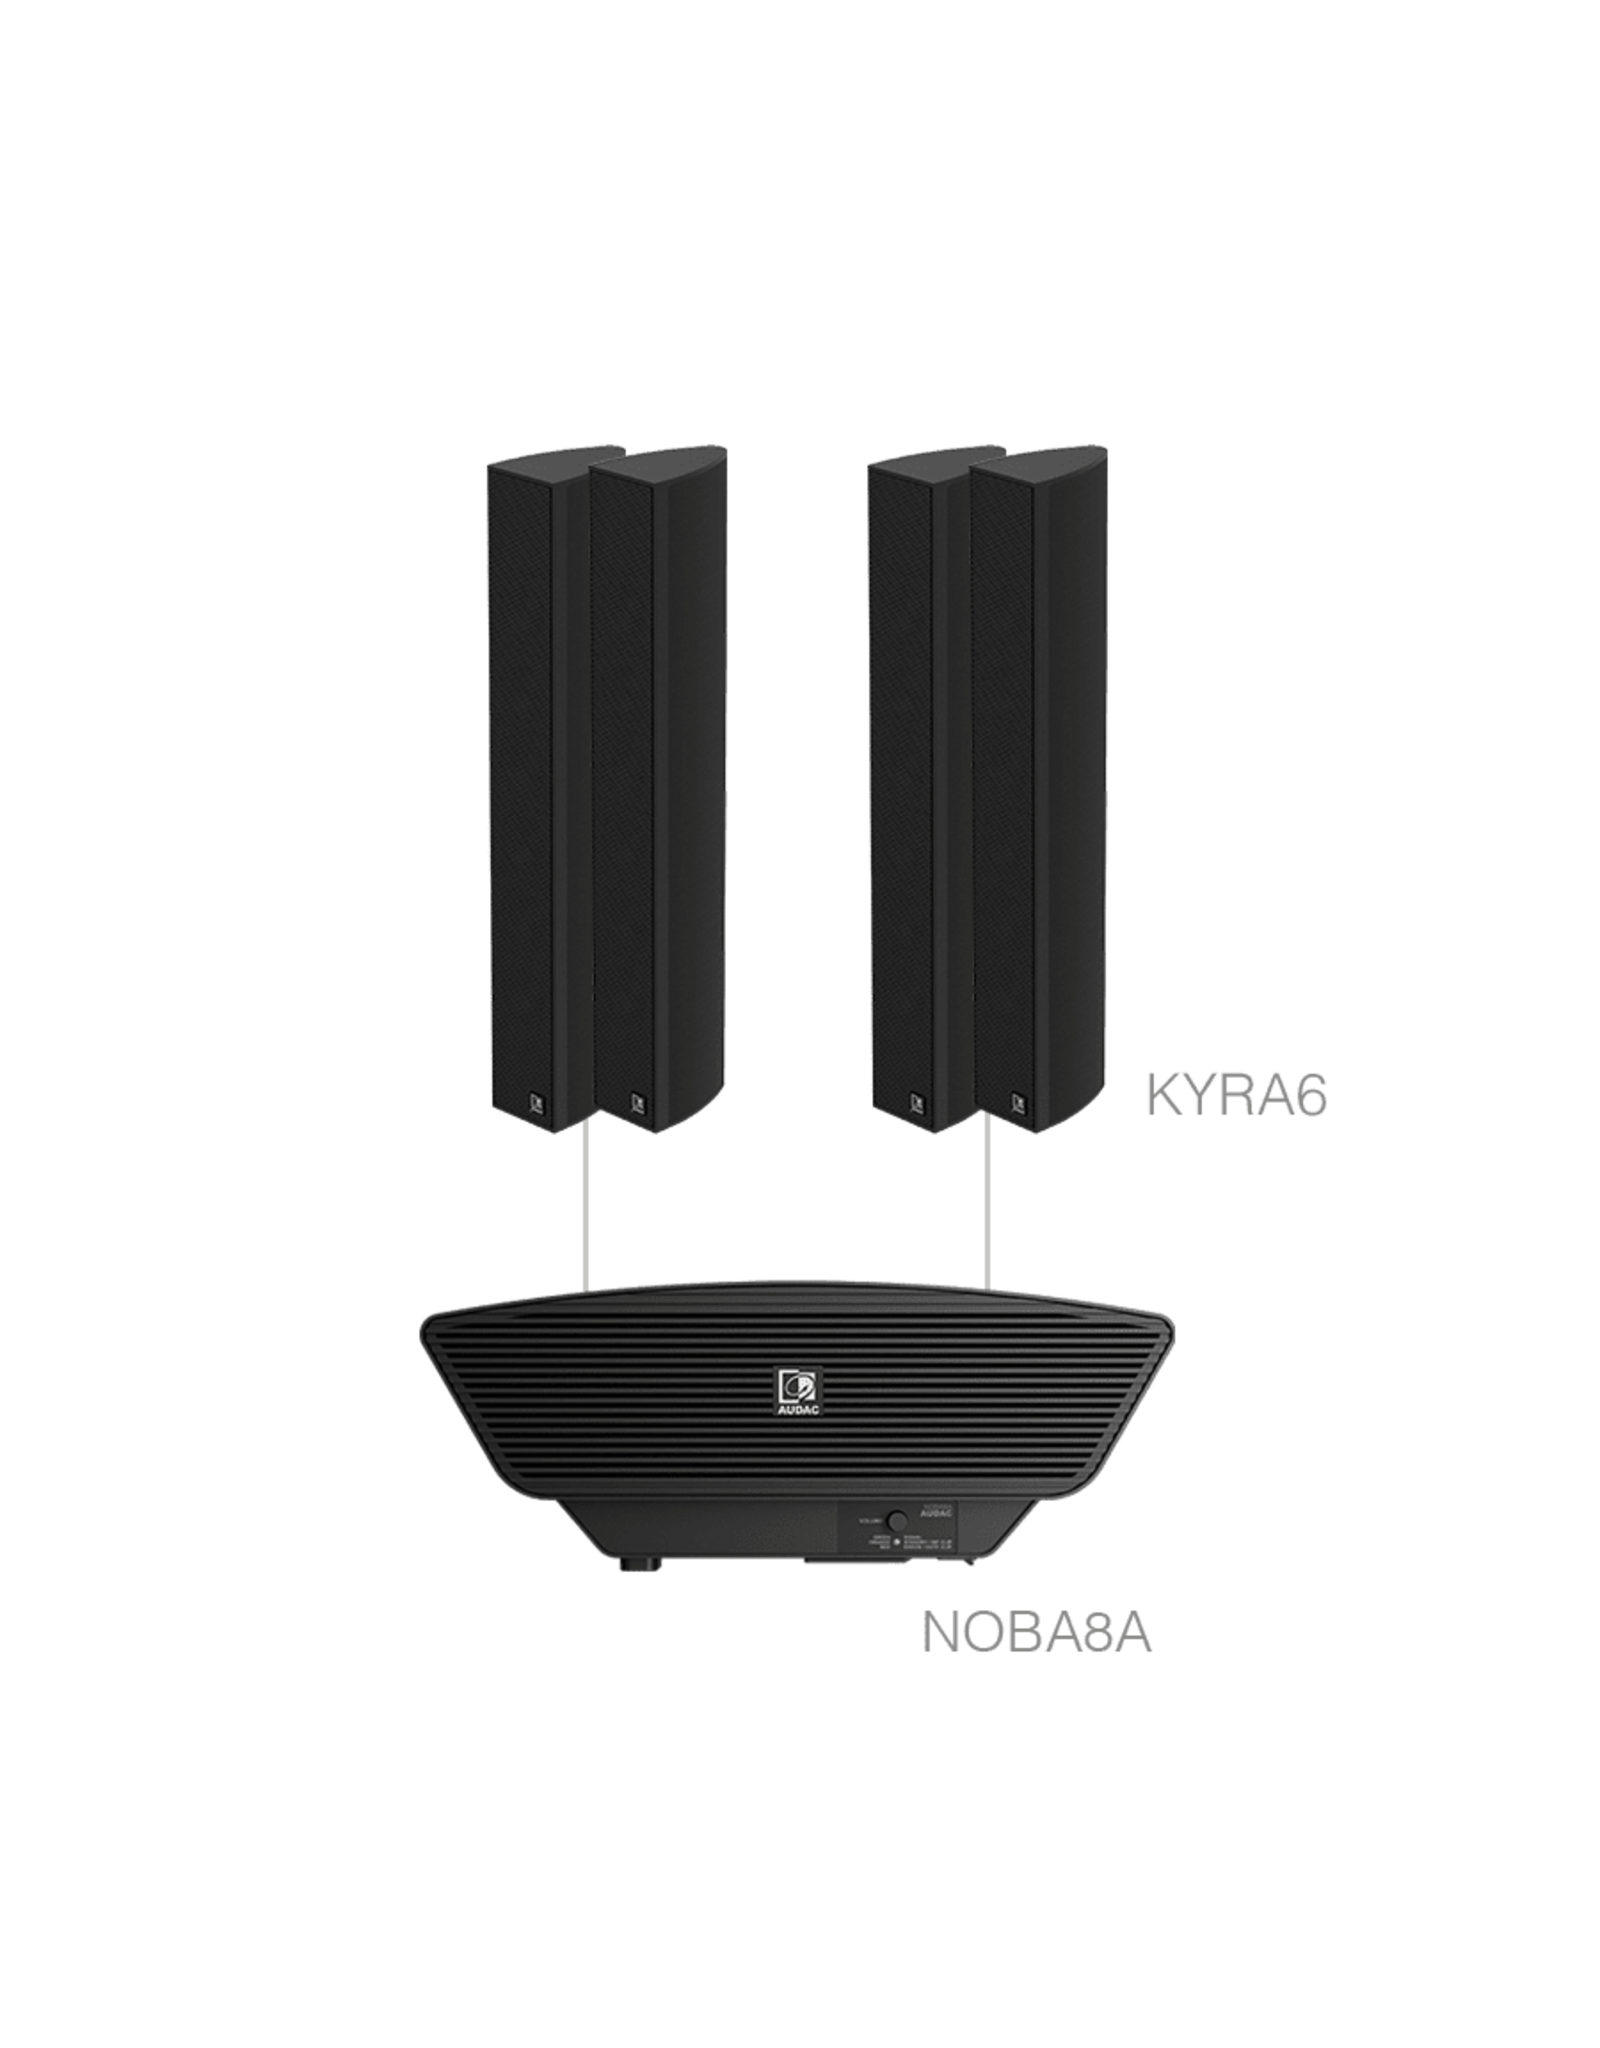 Audac 4 x KYRA6 + NOBA8A Black